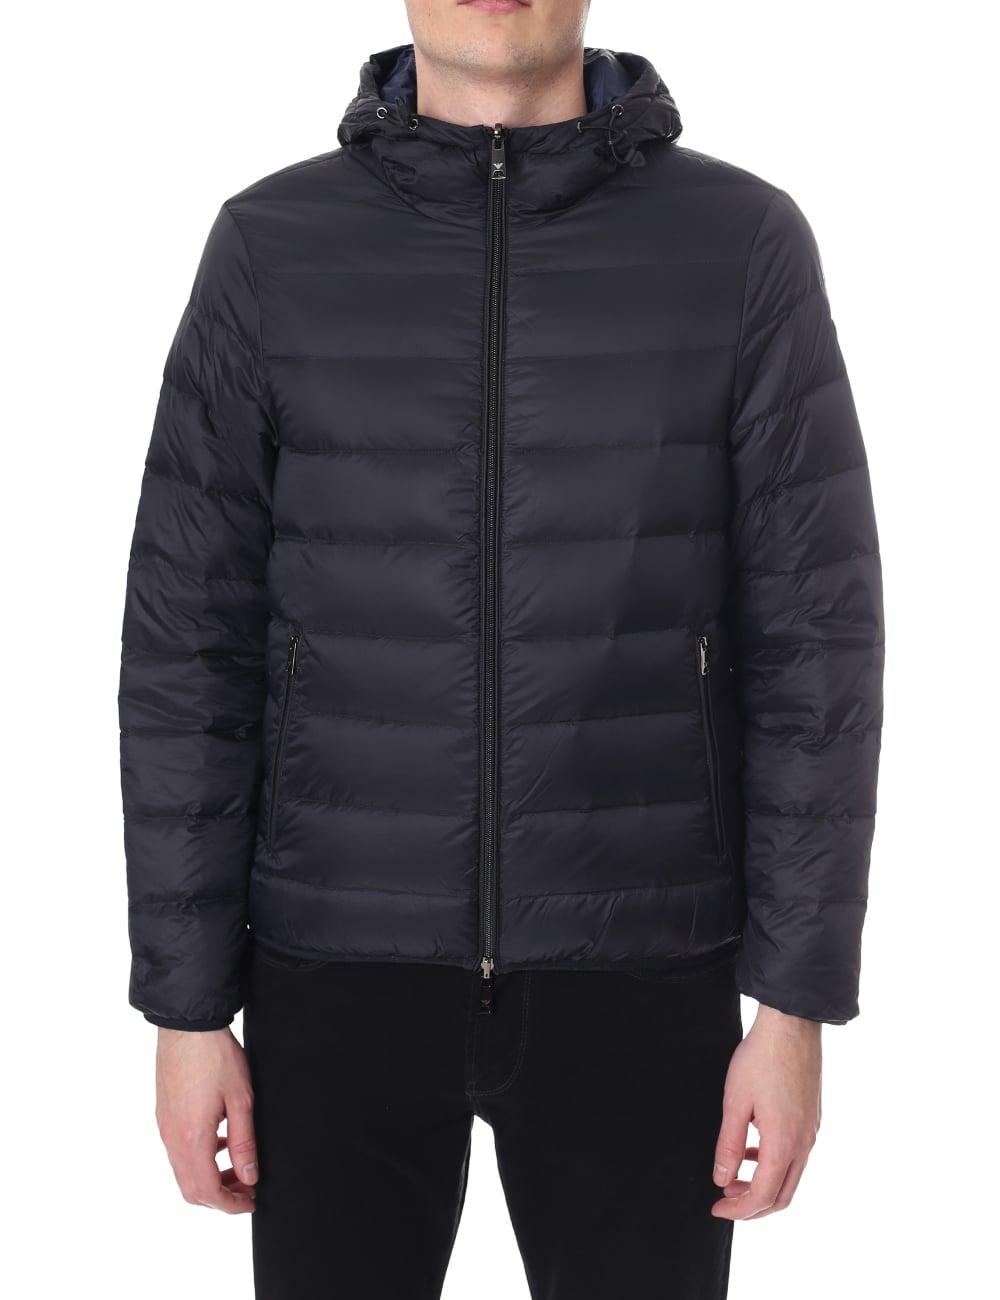 4a74db77eccb Emporio Armani Men s Zip Through Hooded Jacket Black